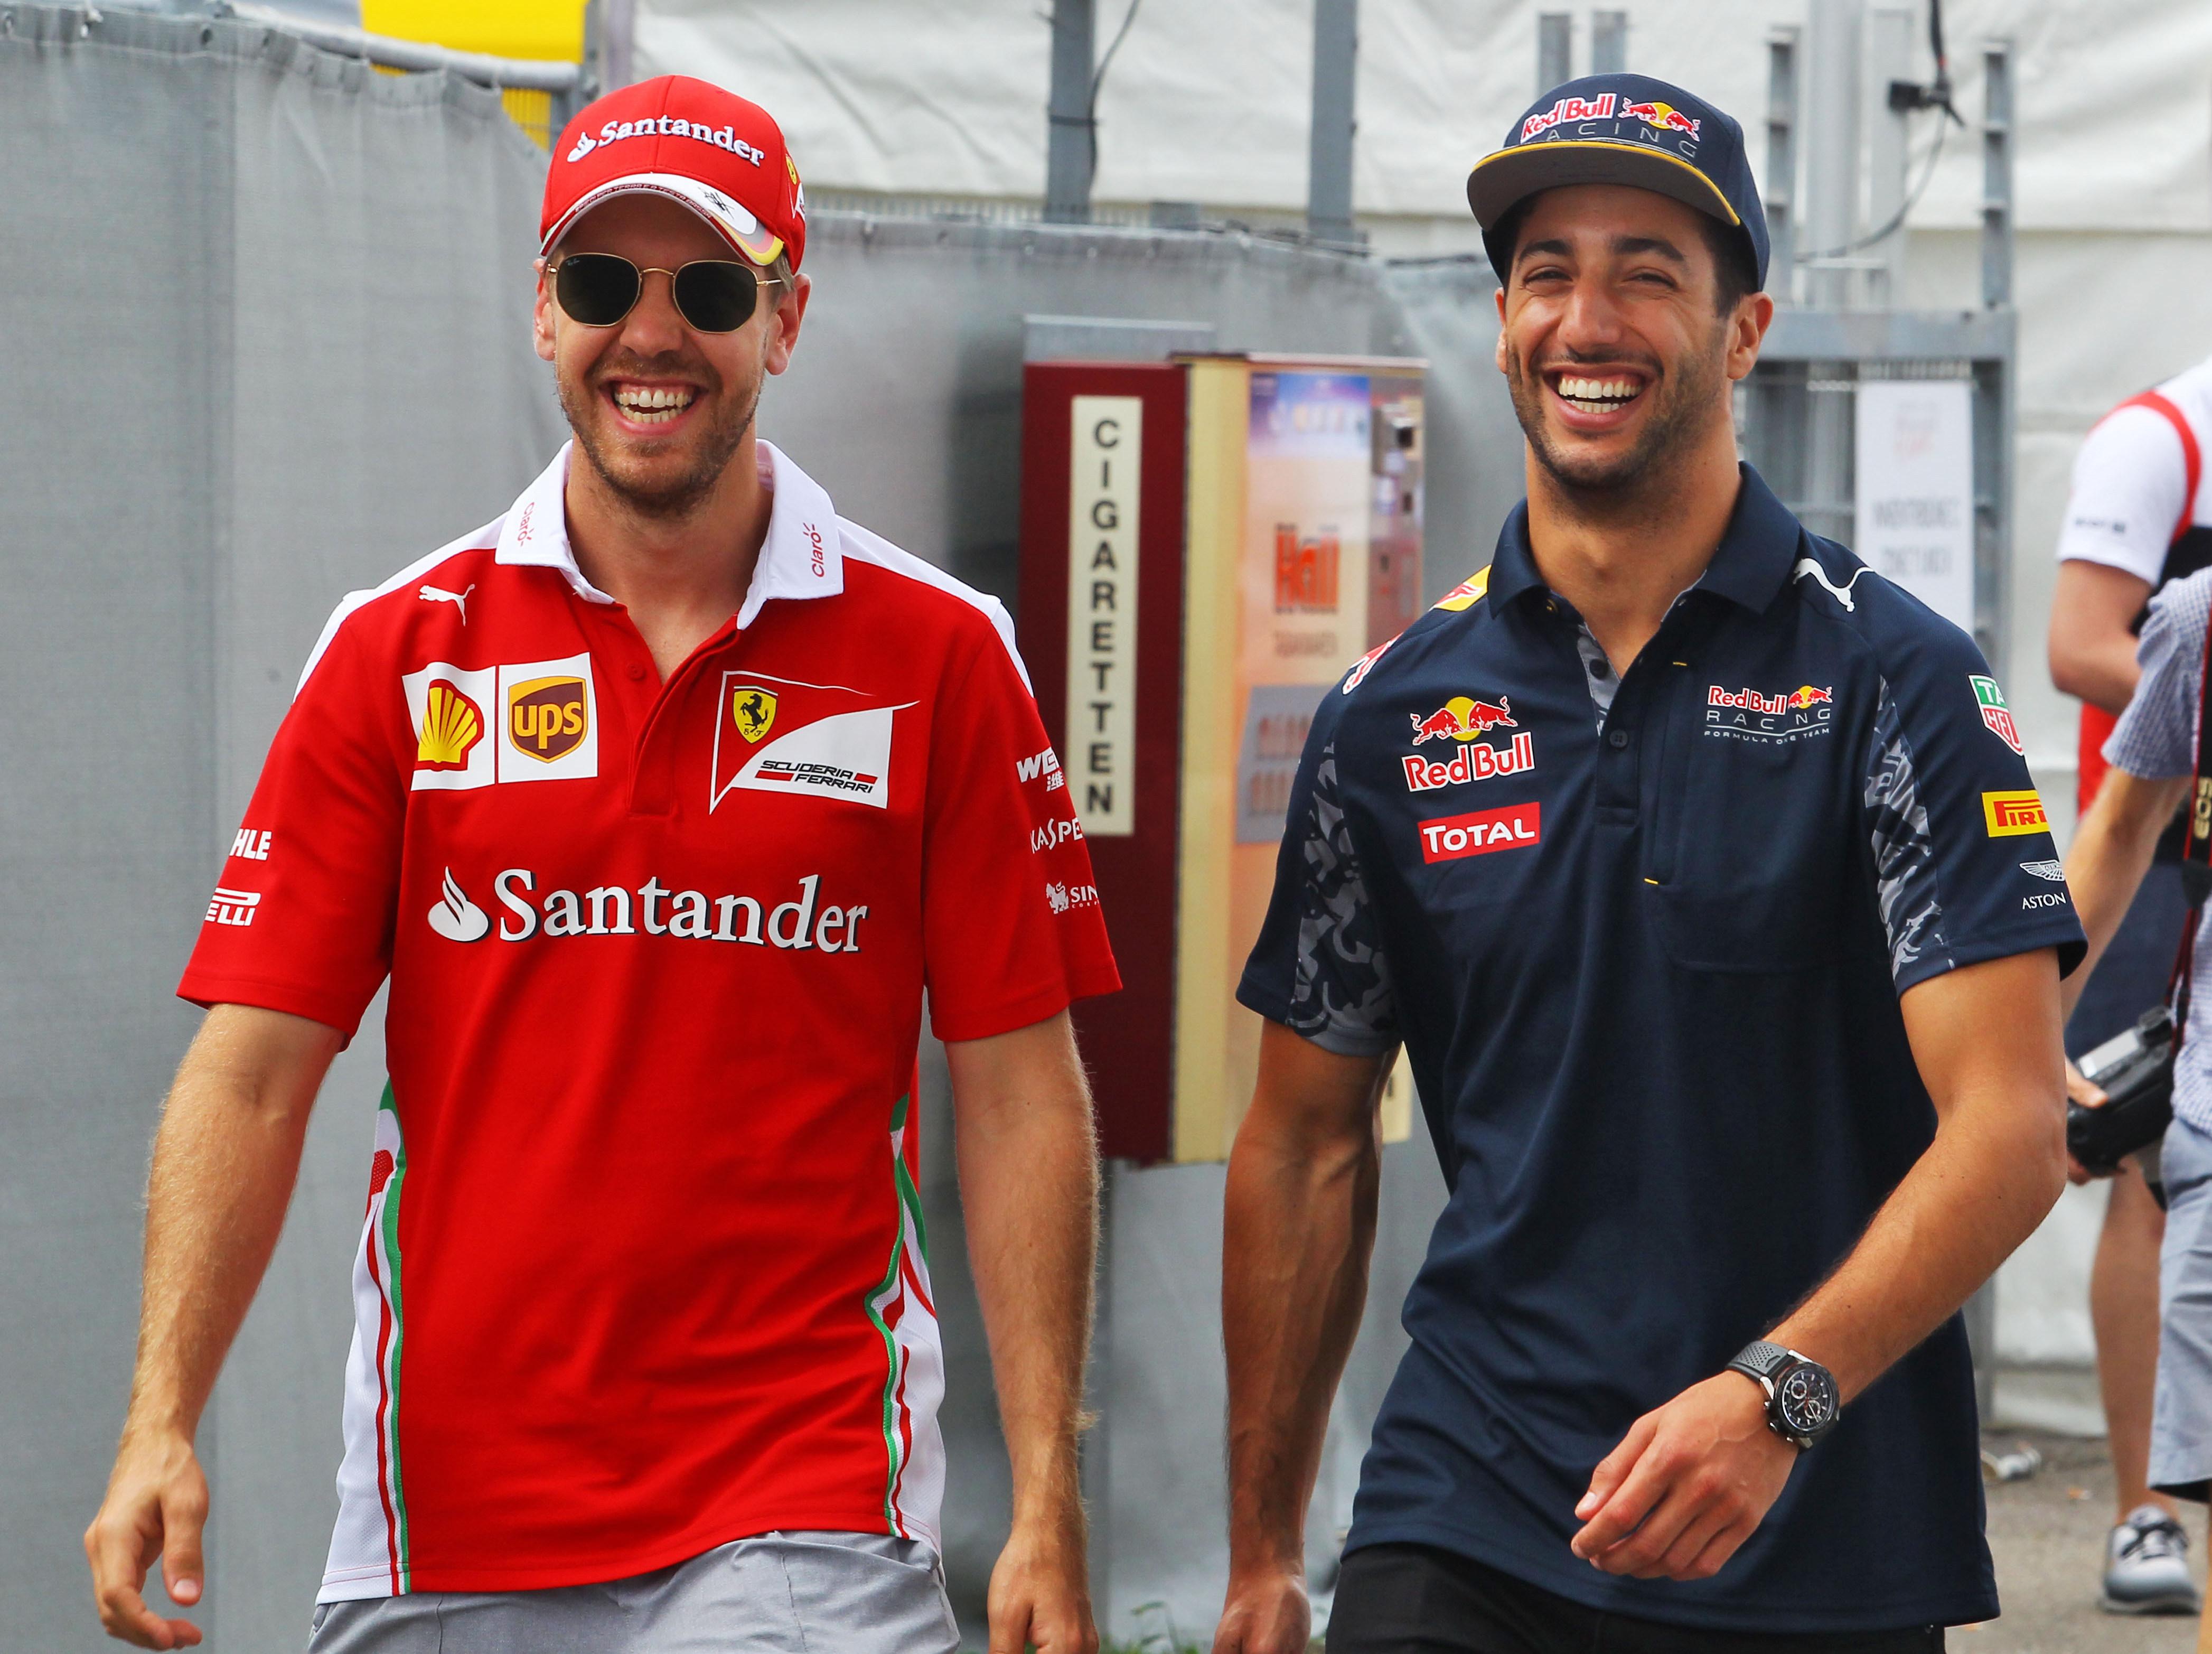 'Vettel is his own worst enemy,' says Ricciardo